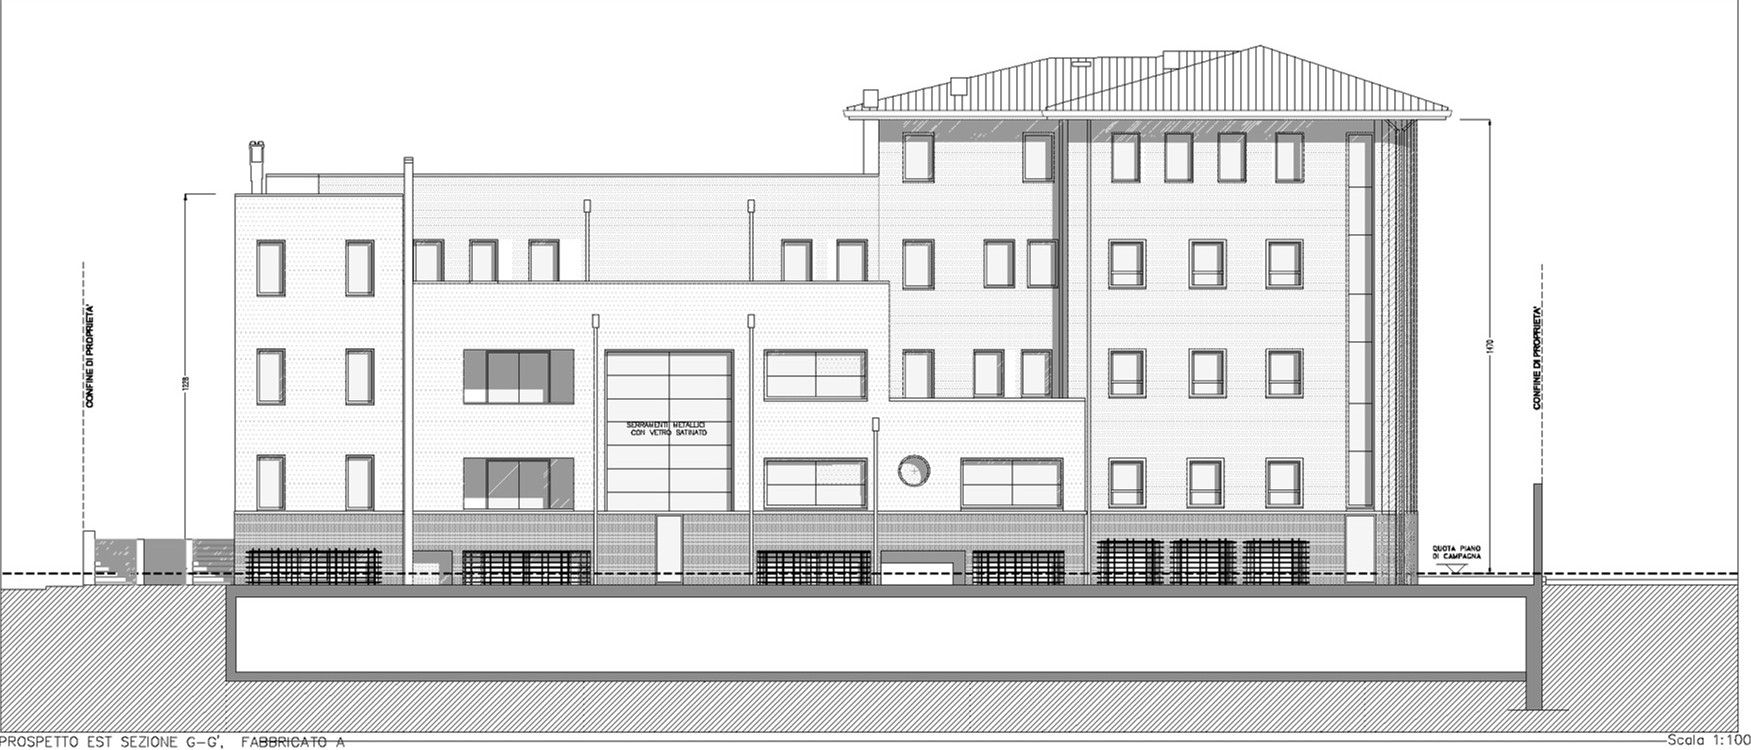 Palazzo Bonfanti - image 5